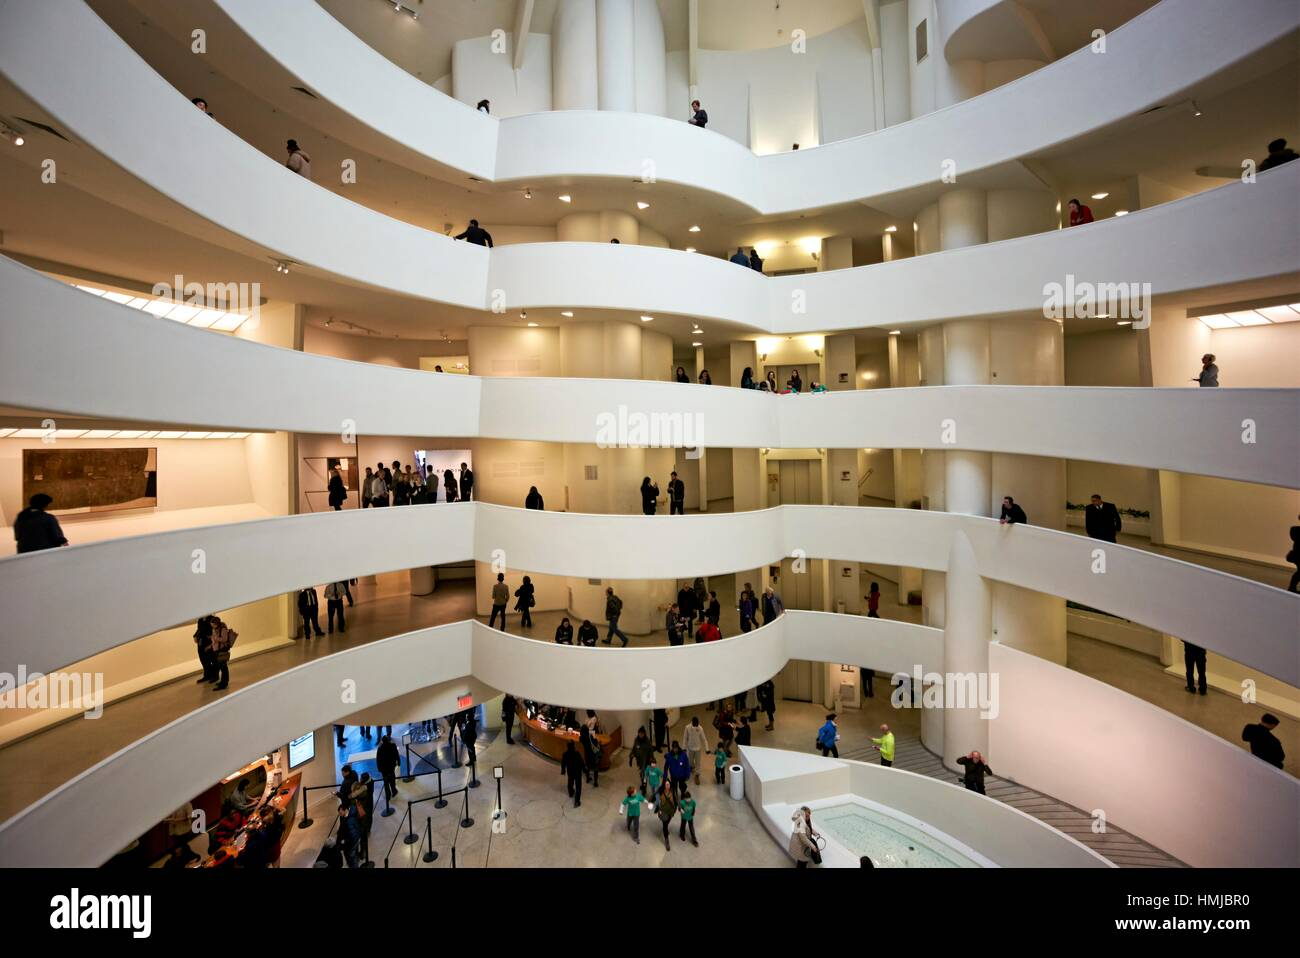 Interior Guggenheim Museum In New Stock Photos   Interior Guggenheim ... efbd2de625ae